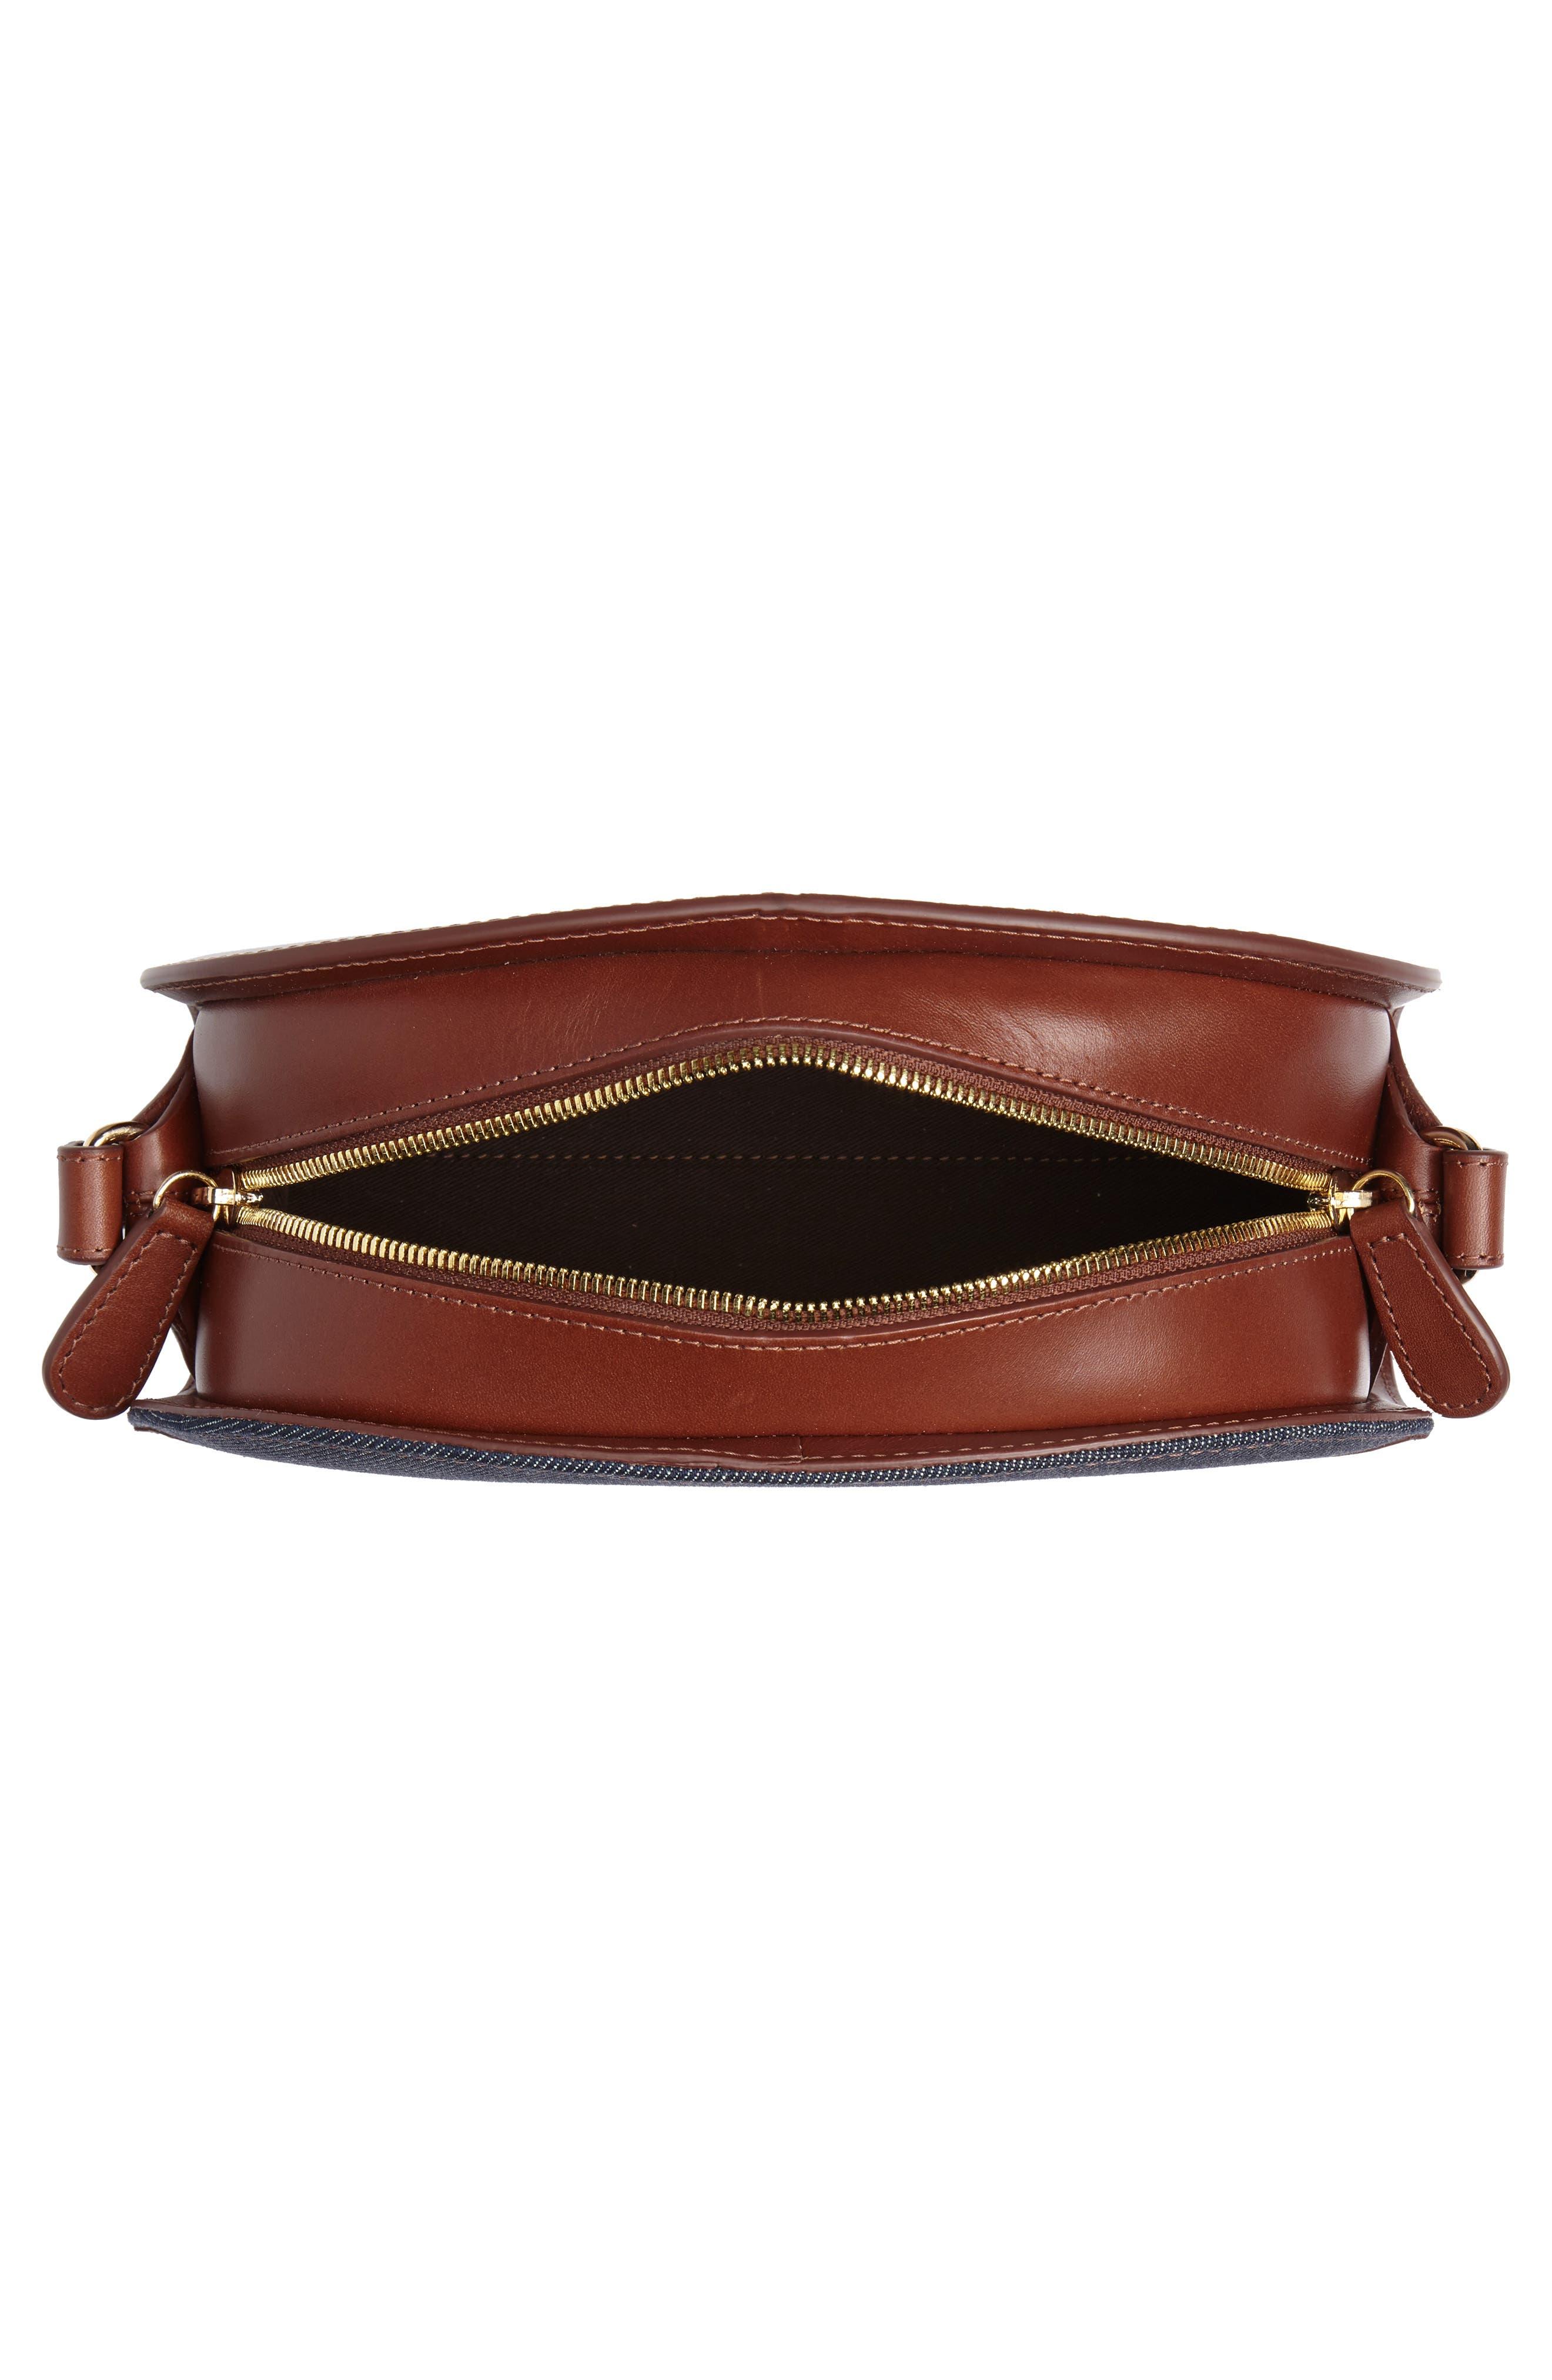 Sac Demilune Leather & Denim Crossbody Bag,                             Alternate thumbnail 4, color,                             NOISETTE CAD